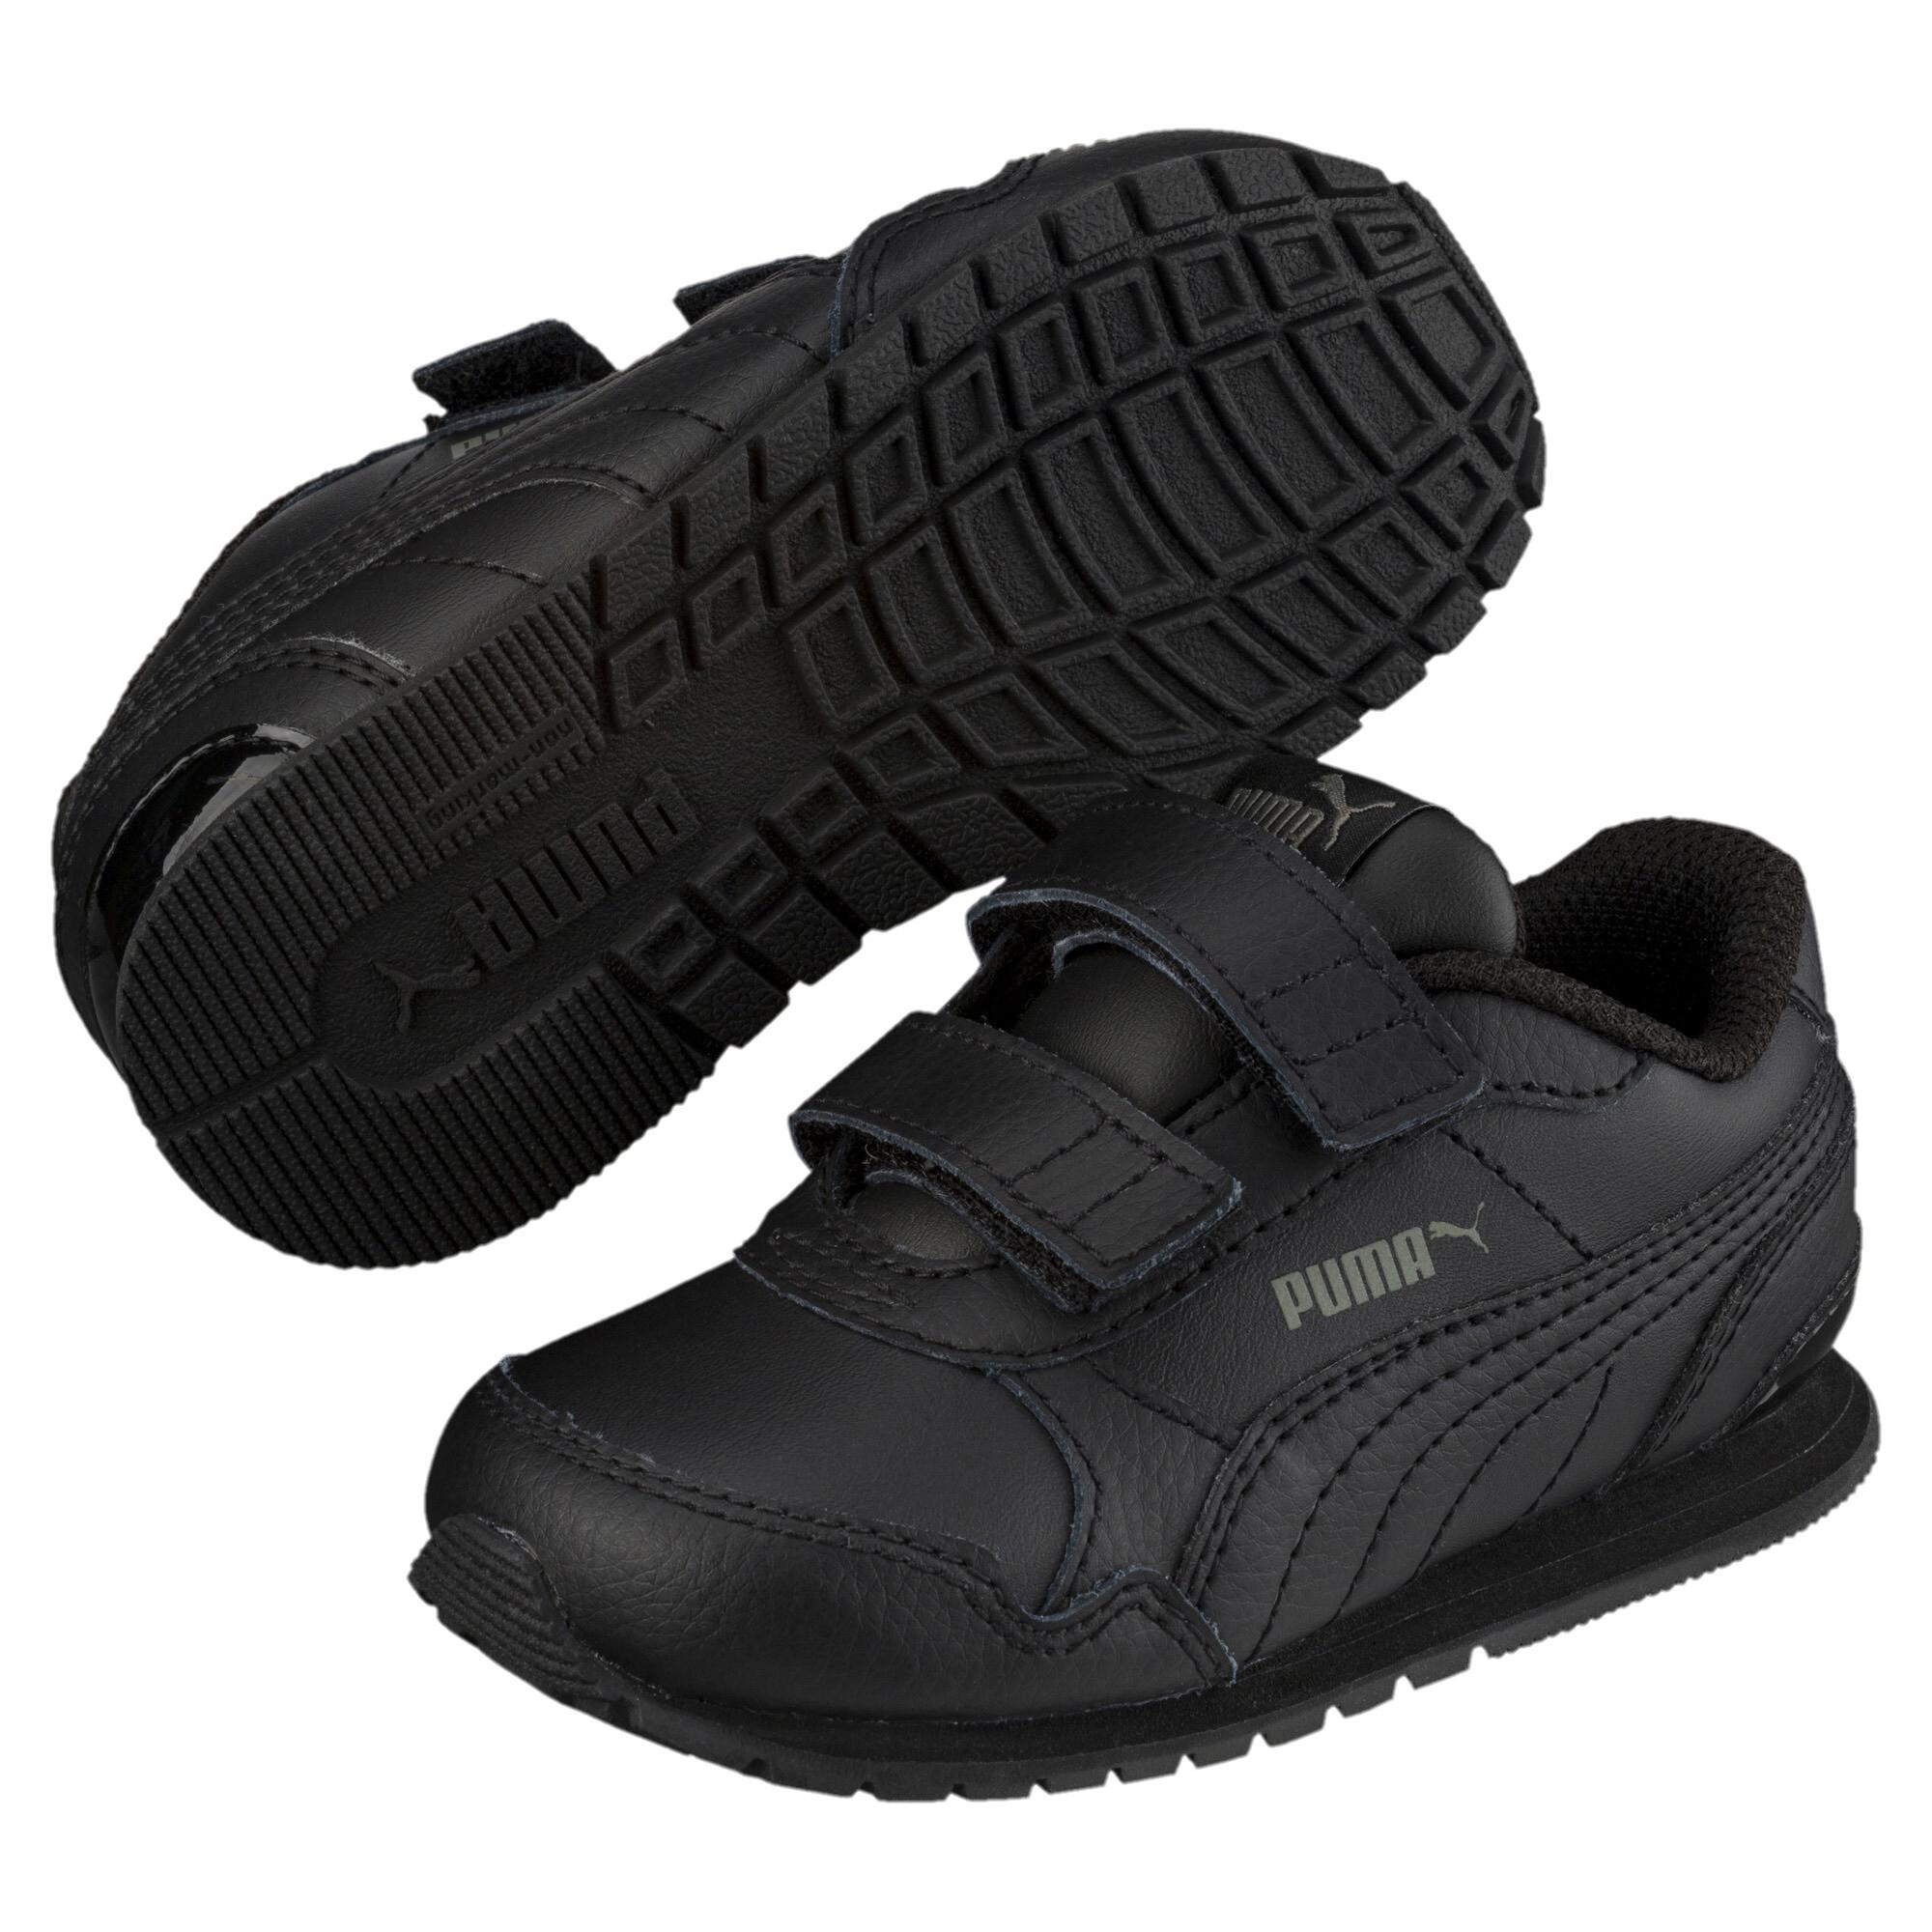 PUMA-ST-Runner-v2-AC-Little-Kids-039-Shoes-Kids-Shoe-Kids thumbnail 3